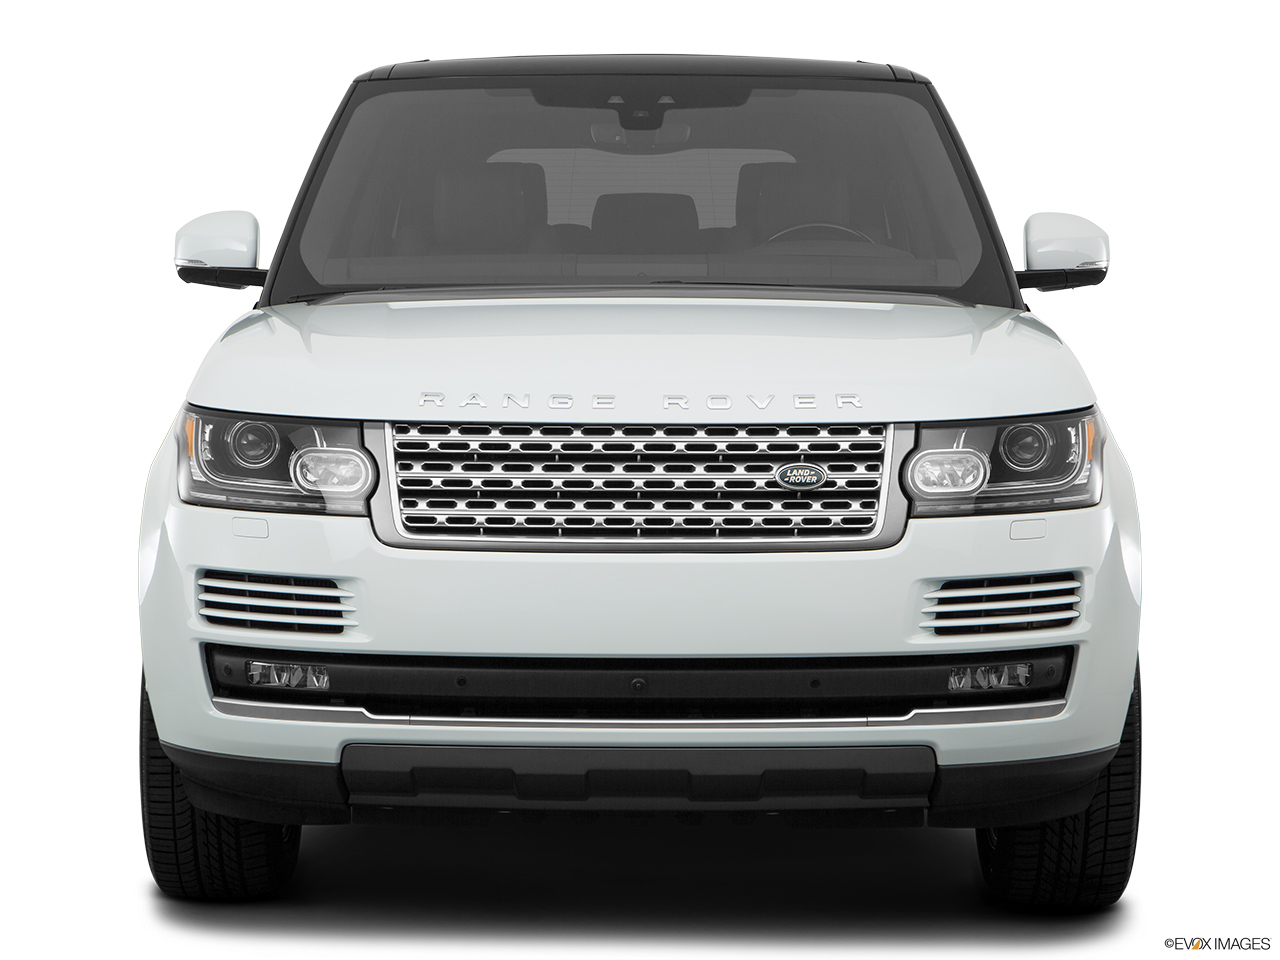 car features list for land rover range rover 2017 sv autobiography bahrain yallamotor. Black Bedroom Furniture Sets. Home Design Ideas